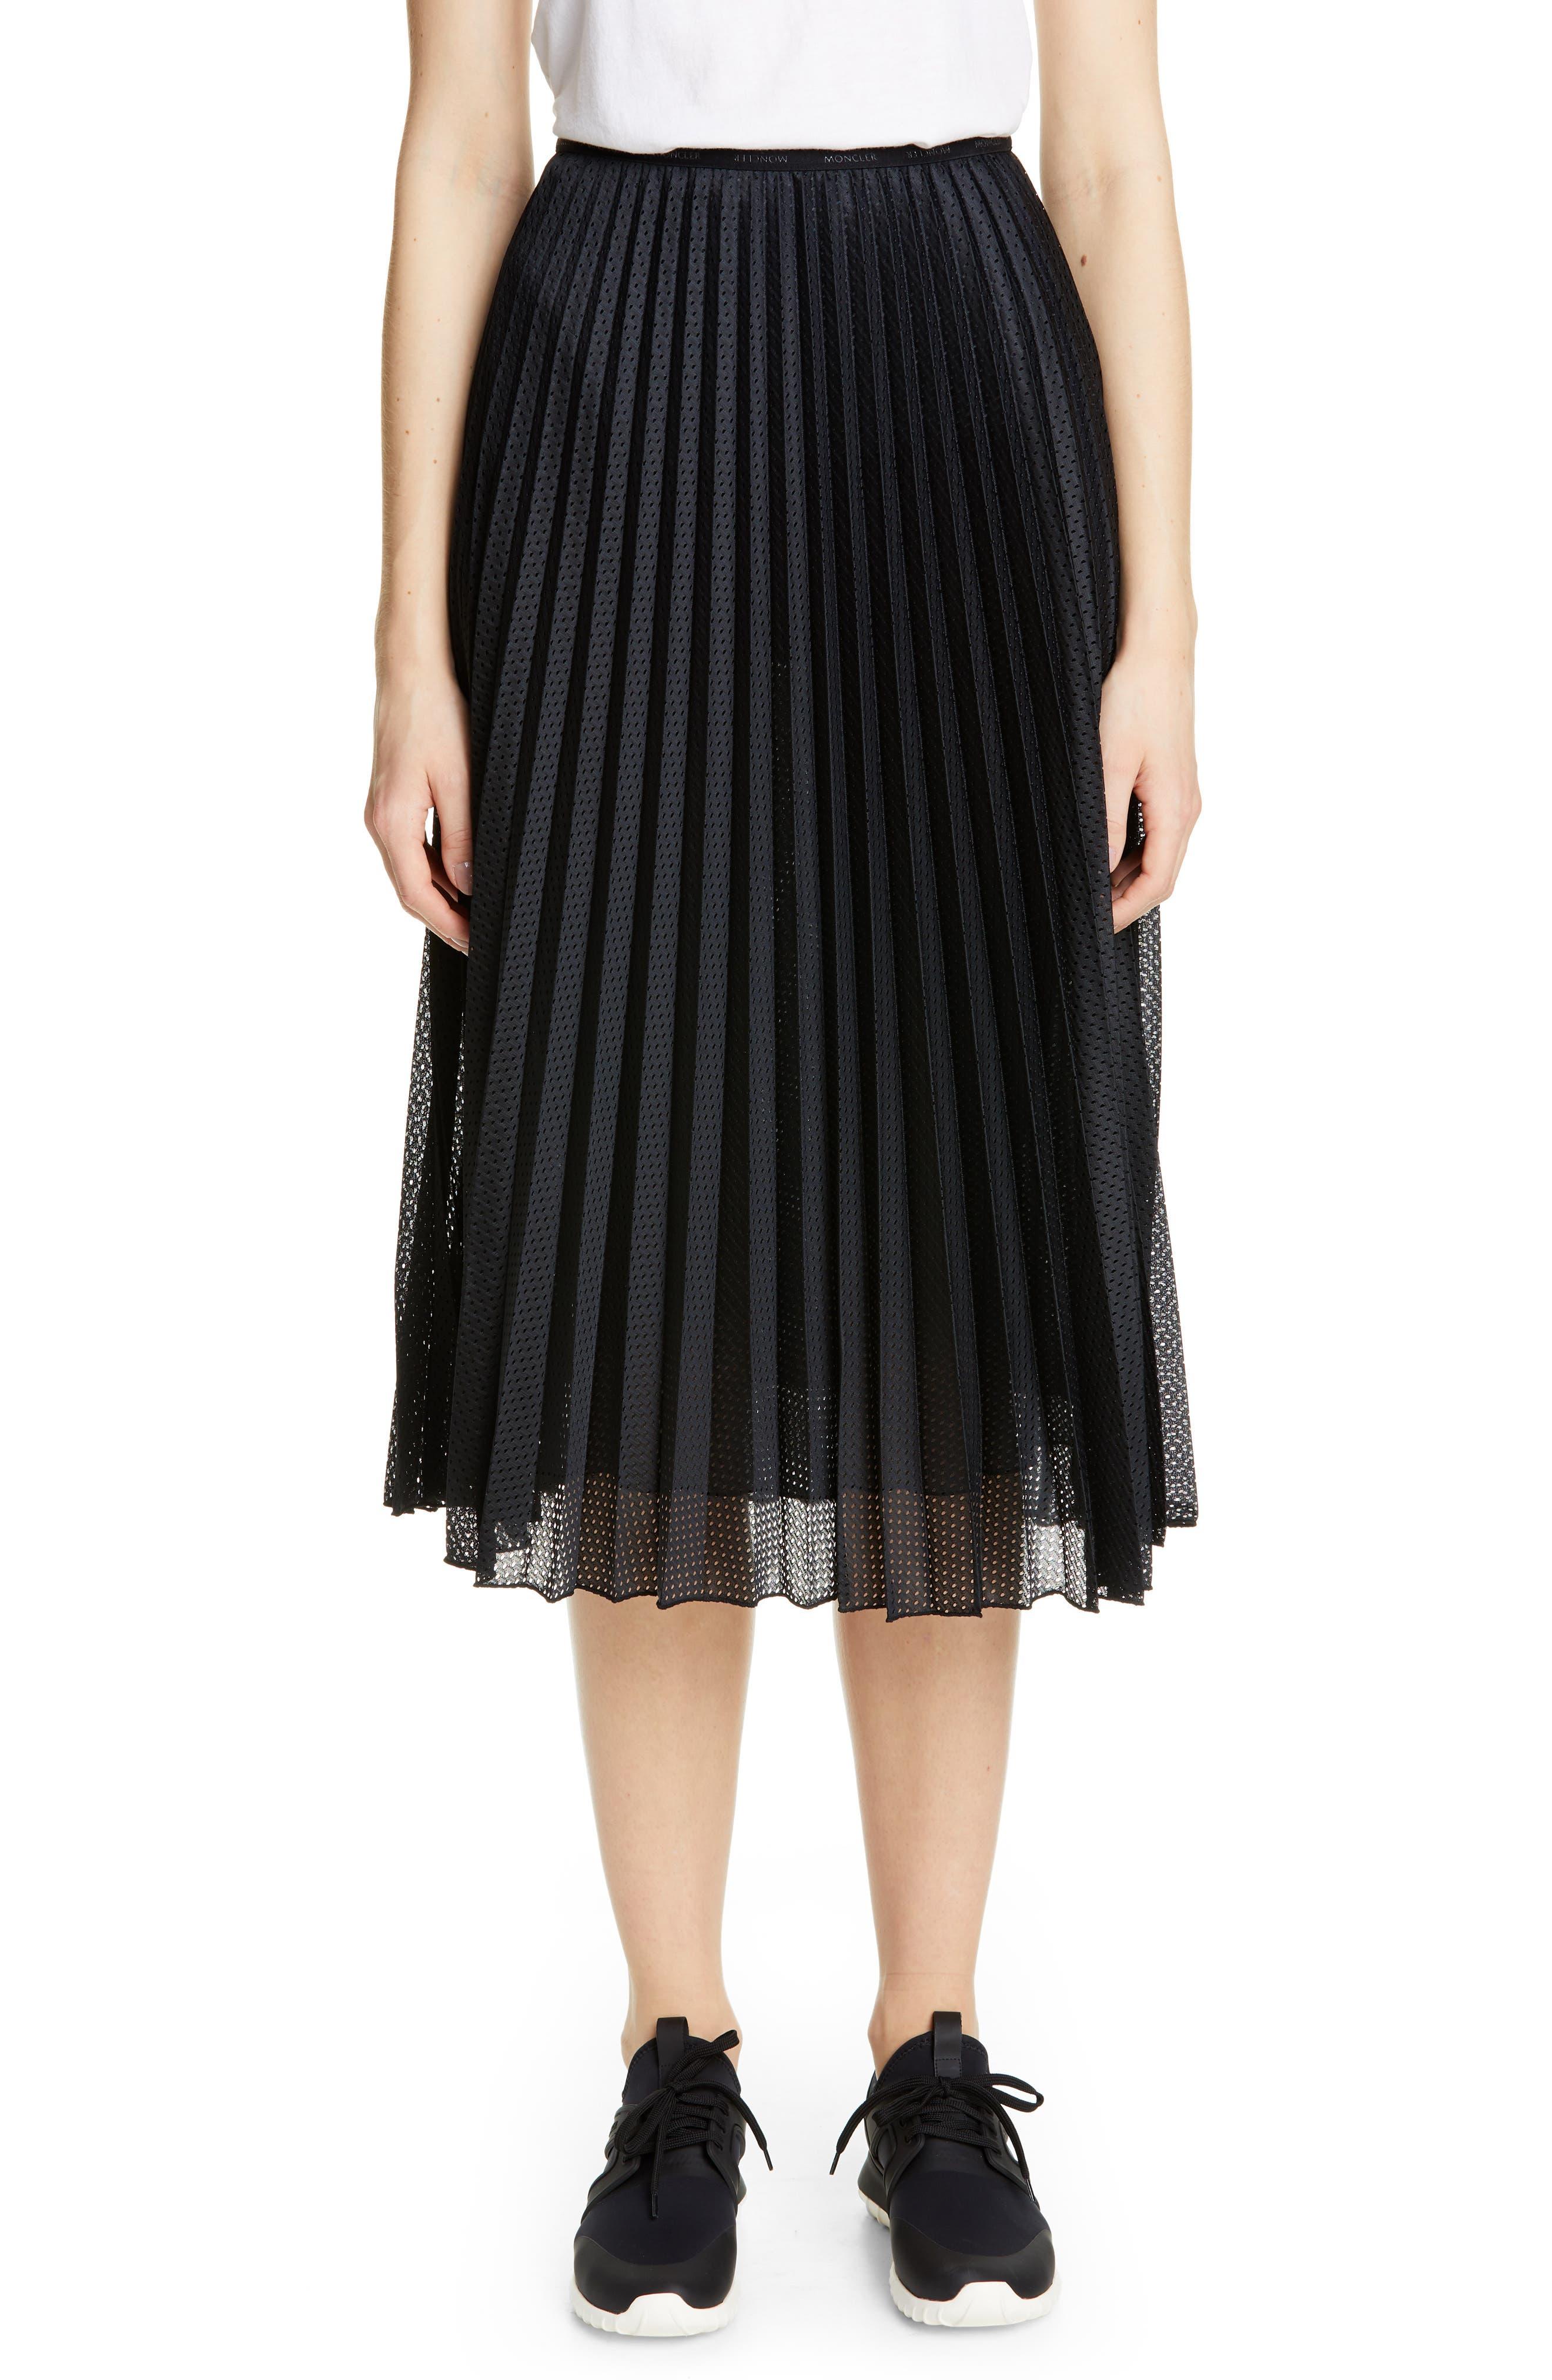 MONCLER, Pleated Mesh Skirt, Main thumbnail 1, color, 001